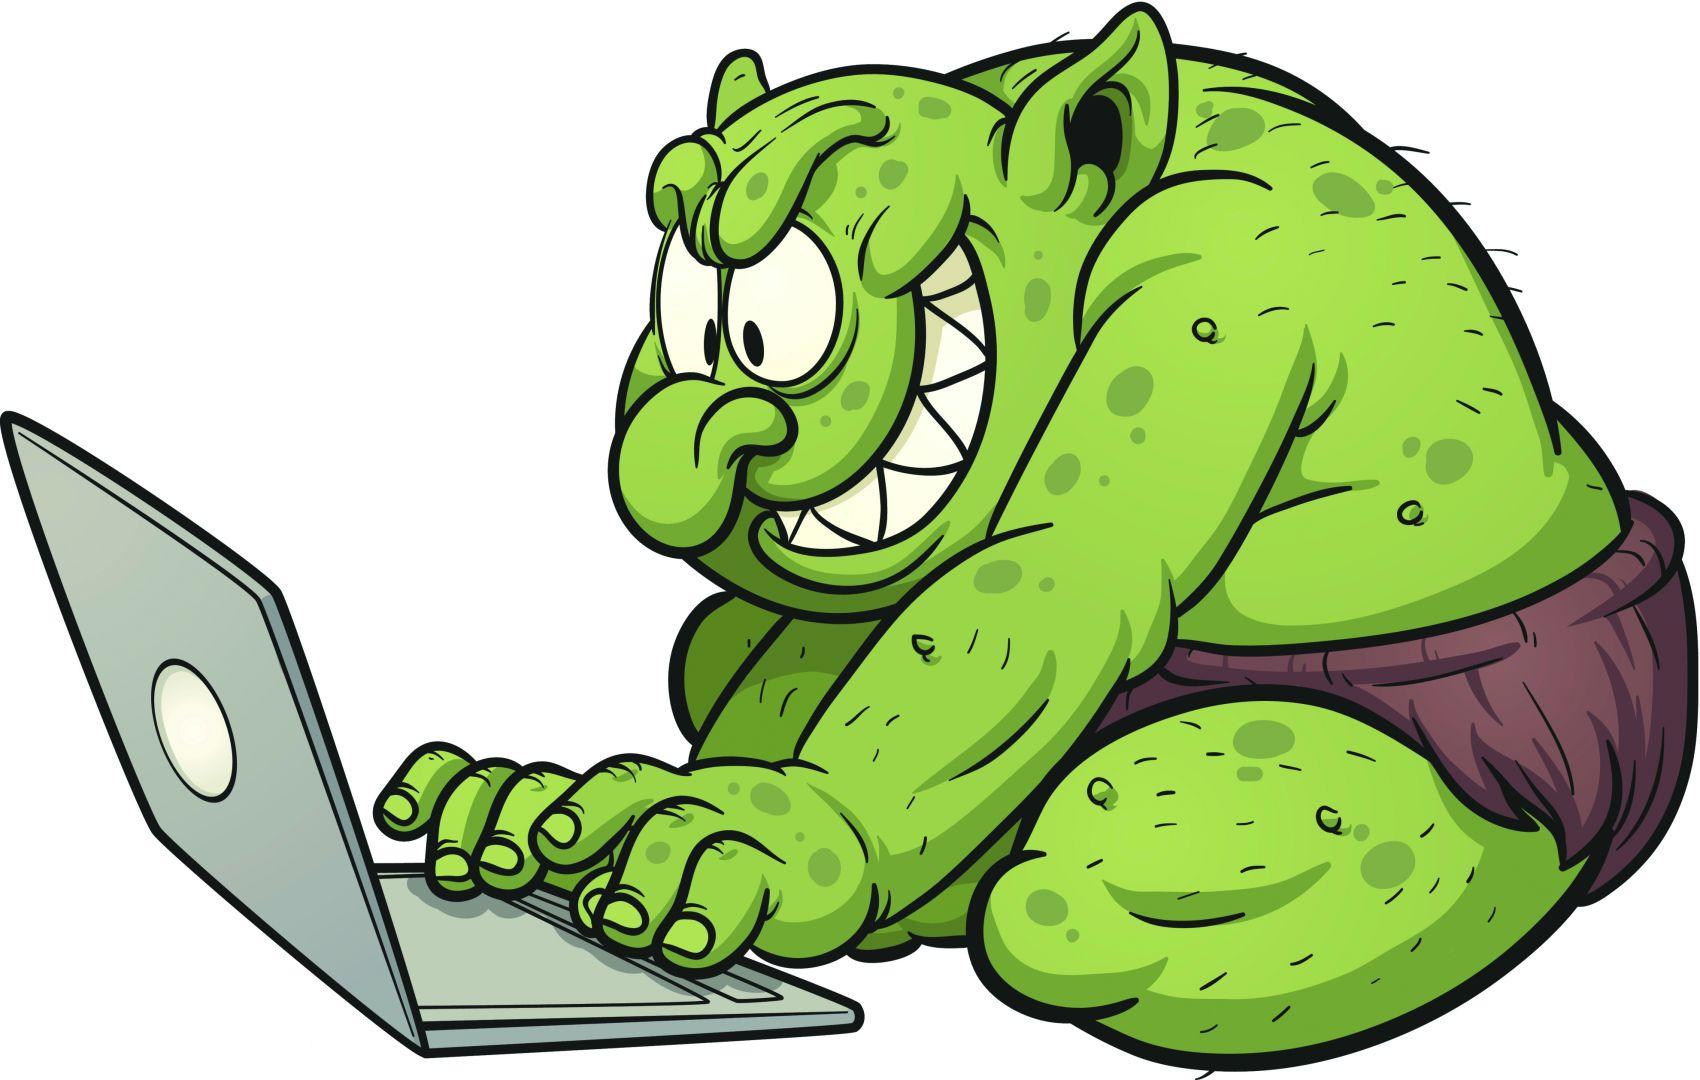 https://i2.wp.com/media.bizzmarkblog.com/2015/03/troll.jpg